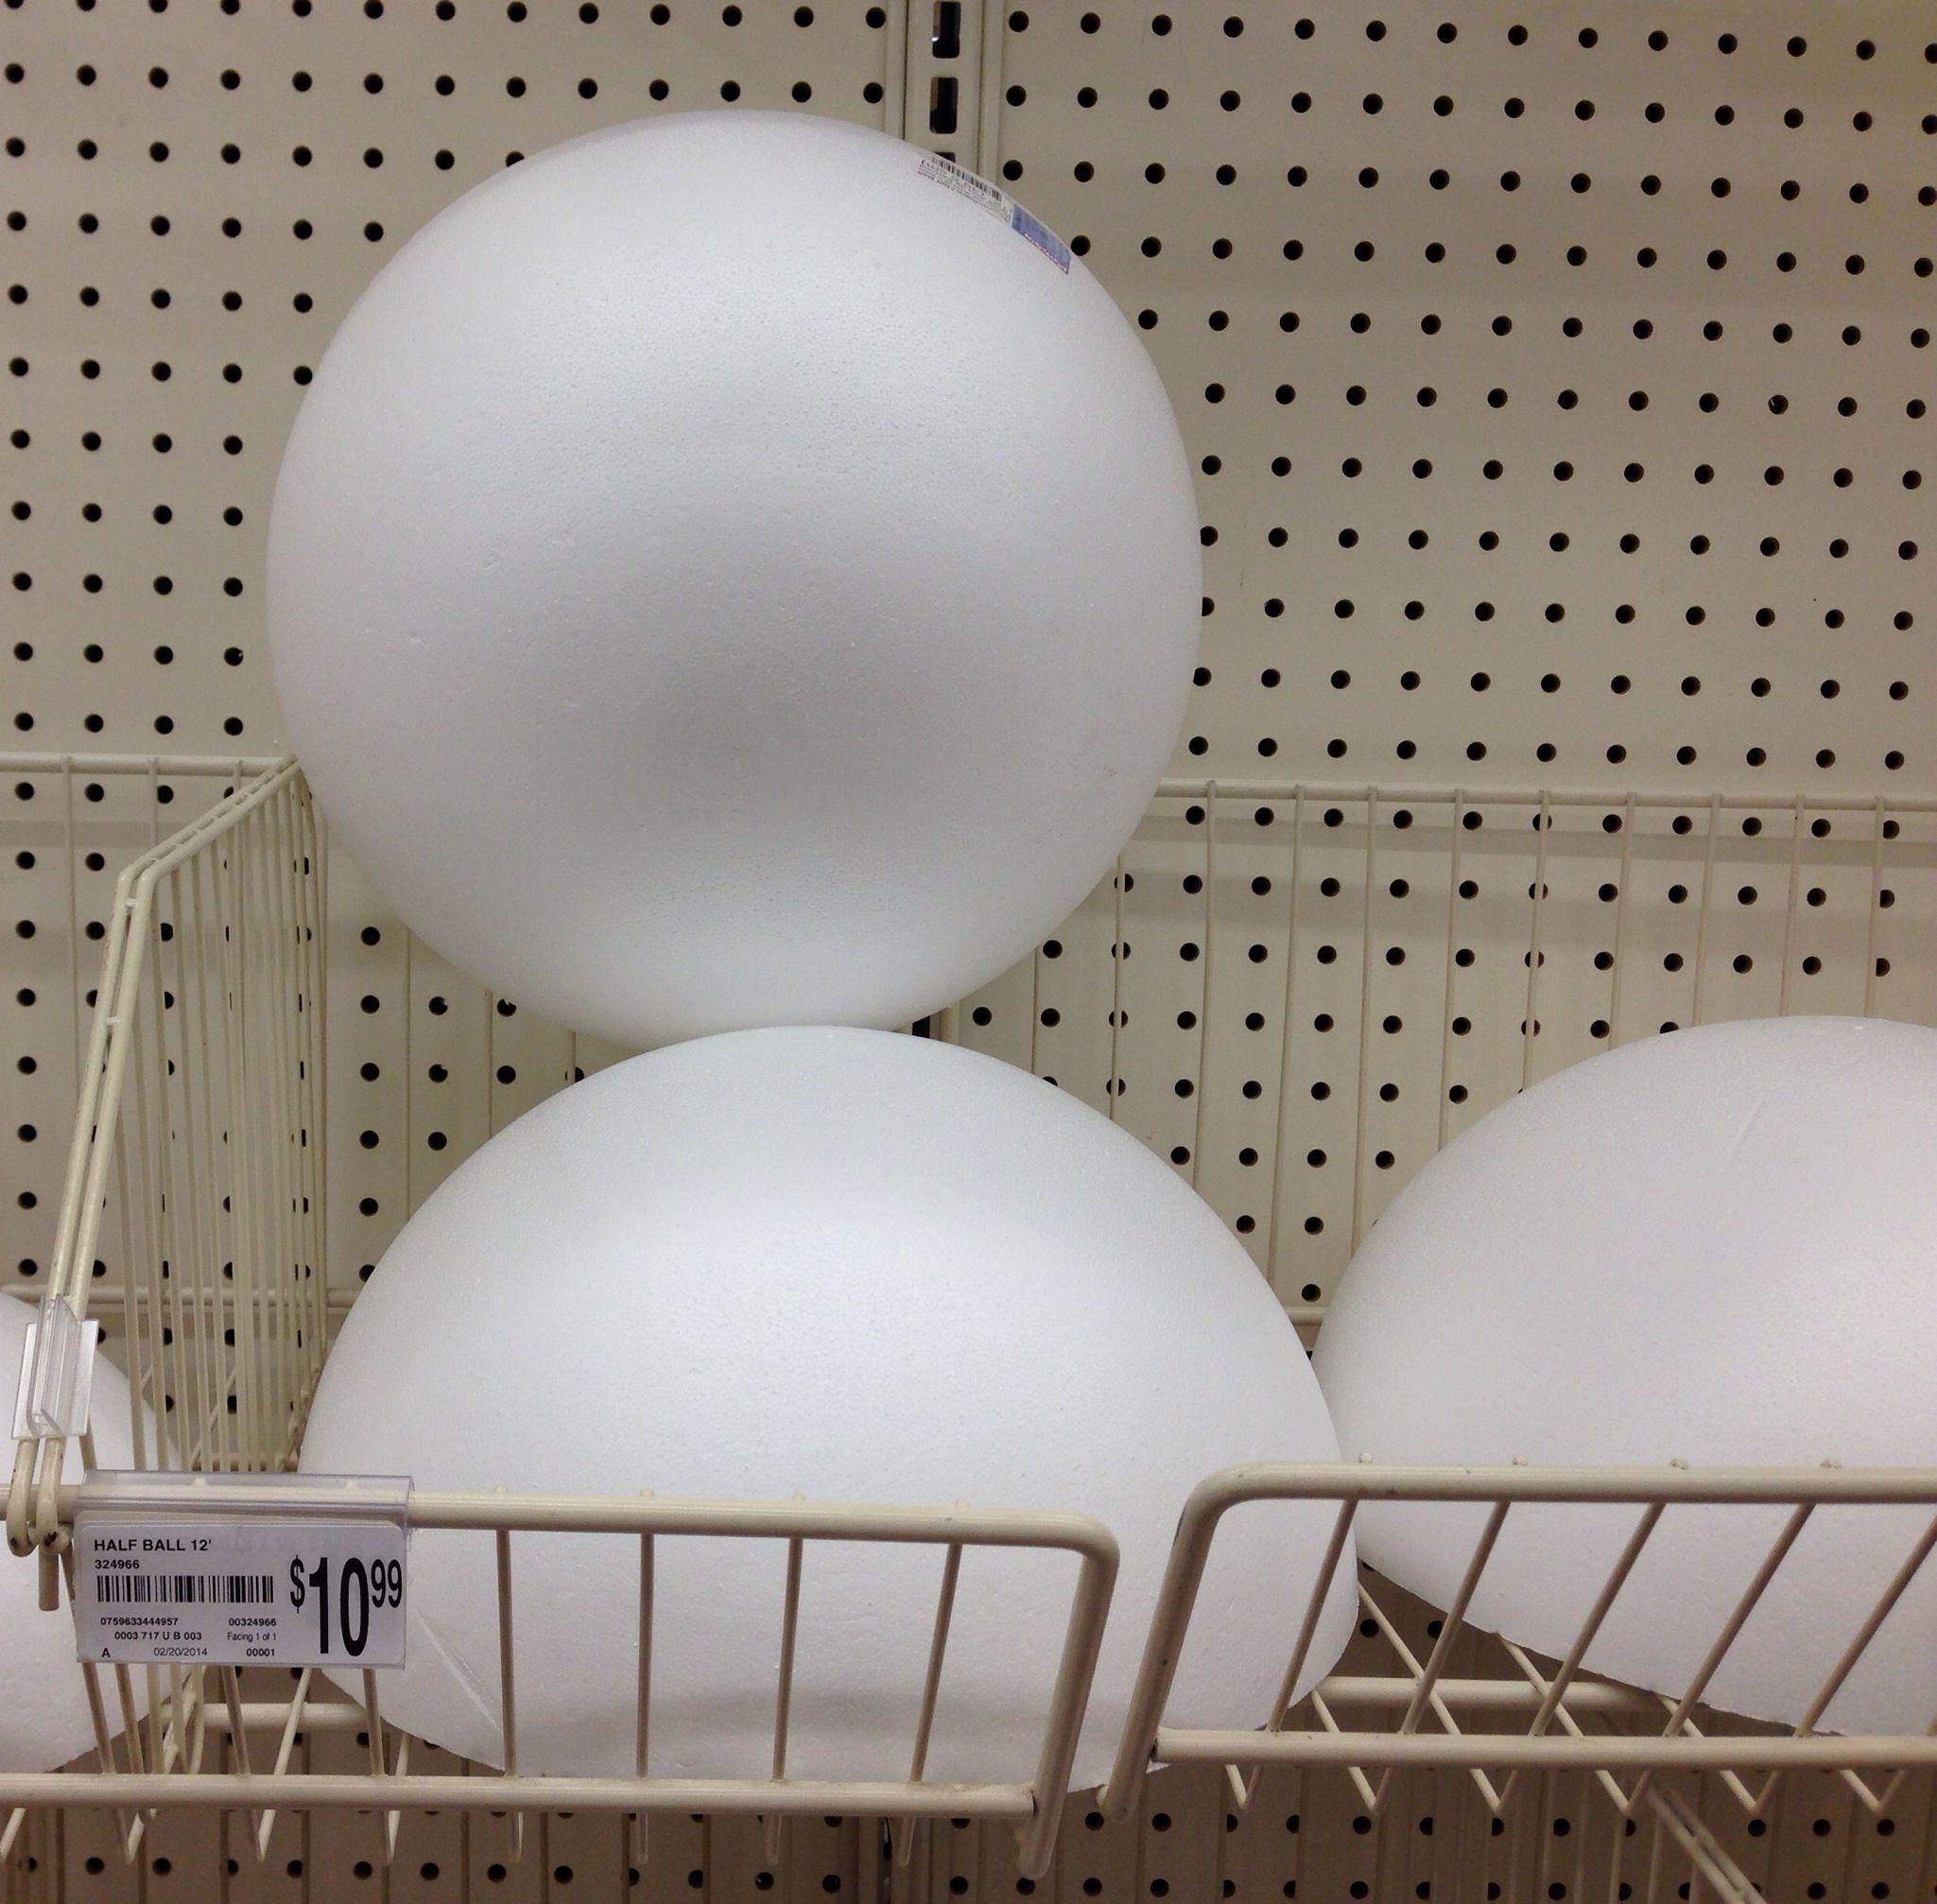 how to cut styrofoam ball in half